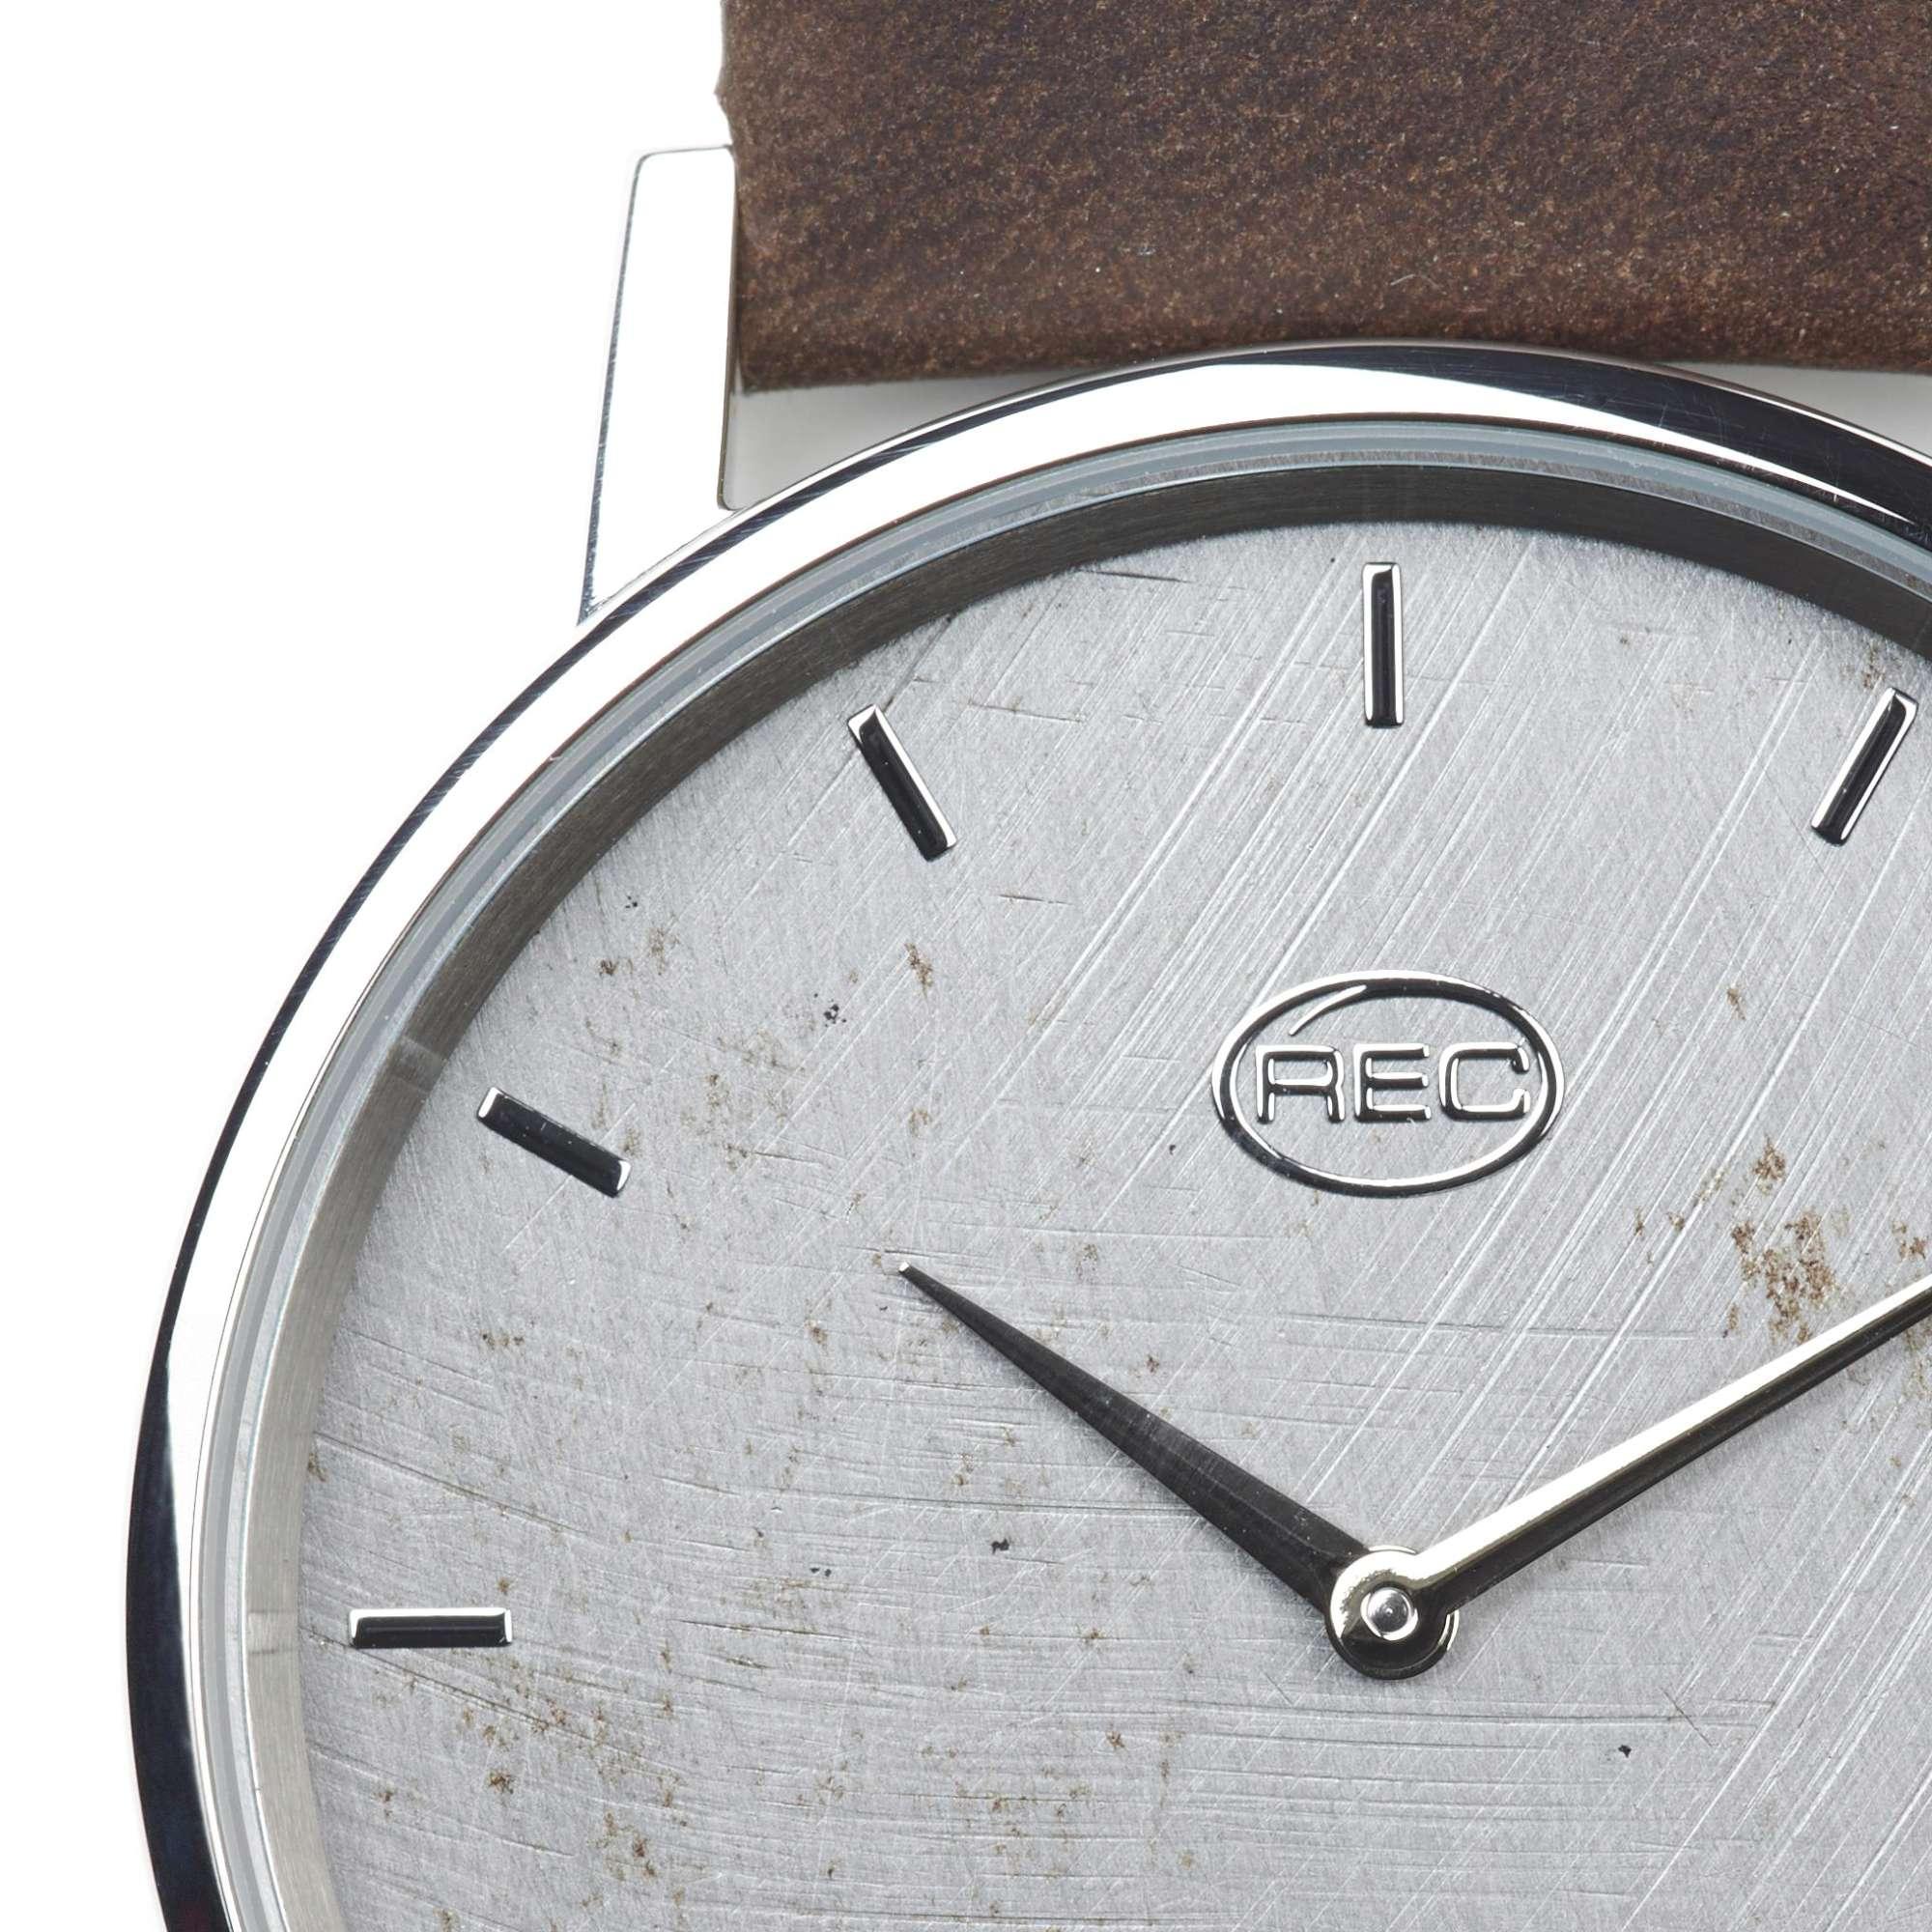 REC-Watches_001-2000